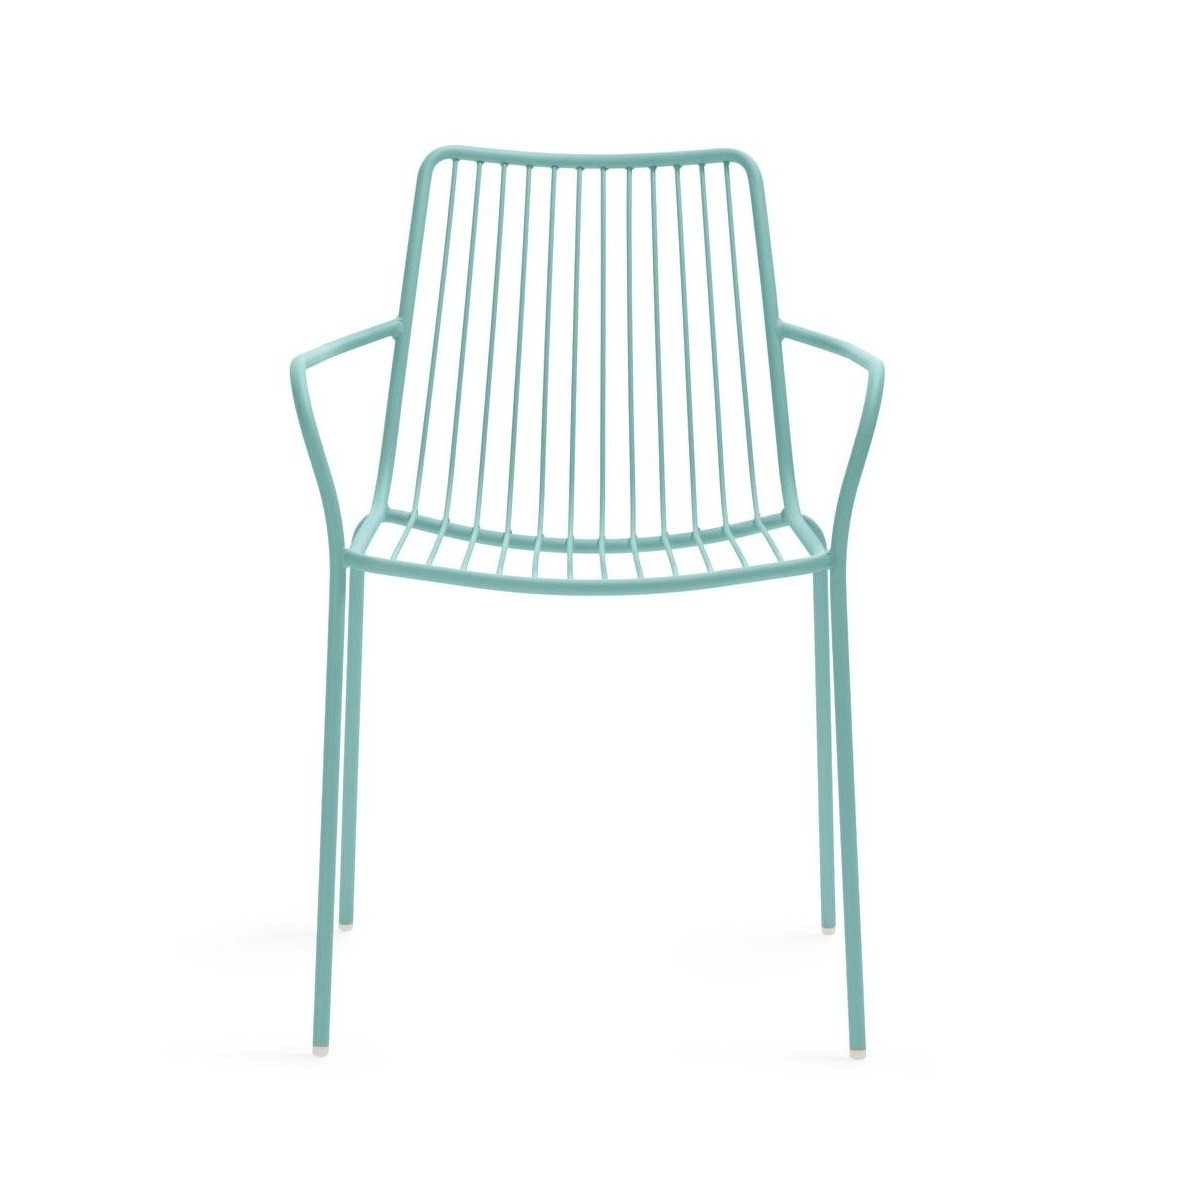 Pedrali   Nolita 3656 Armchair/ High Backrest   Turquoise